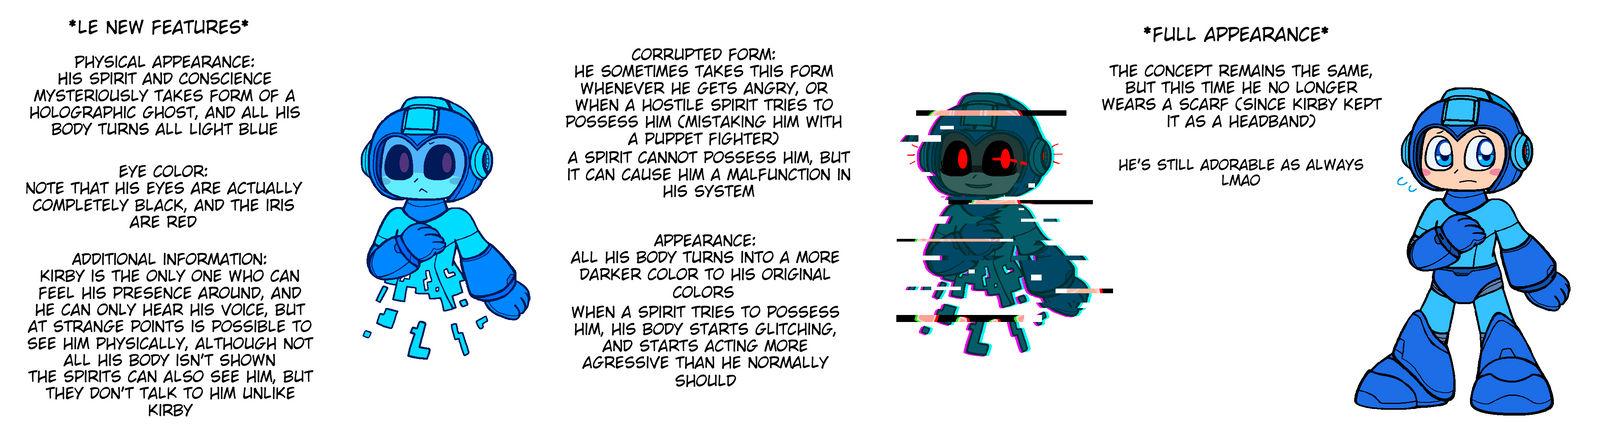 SSBU AU: Rockman/Megaman by The9Lord on DeviantArt